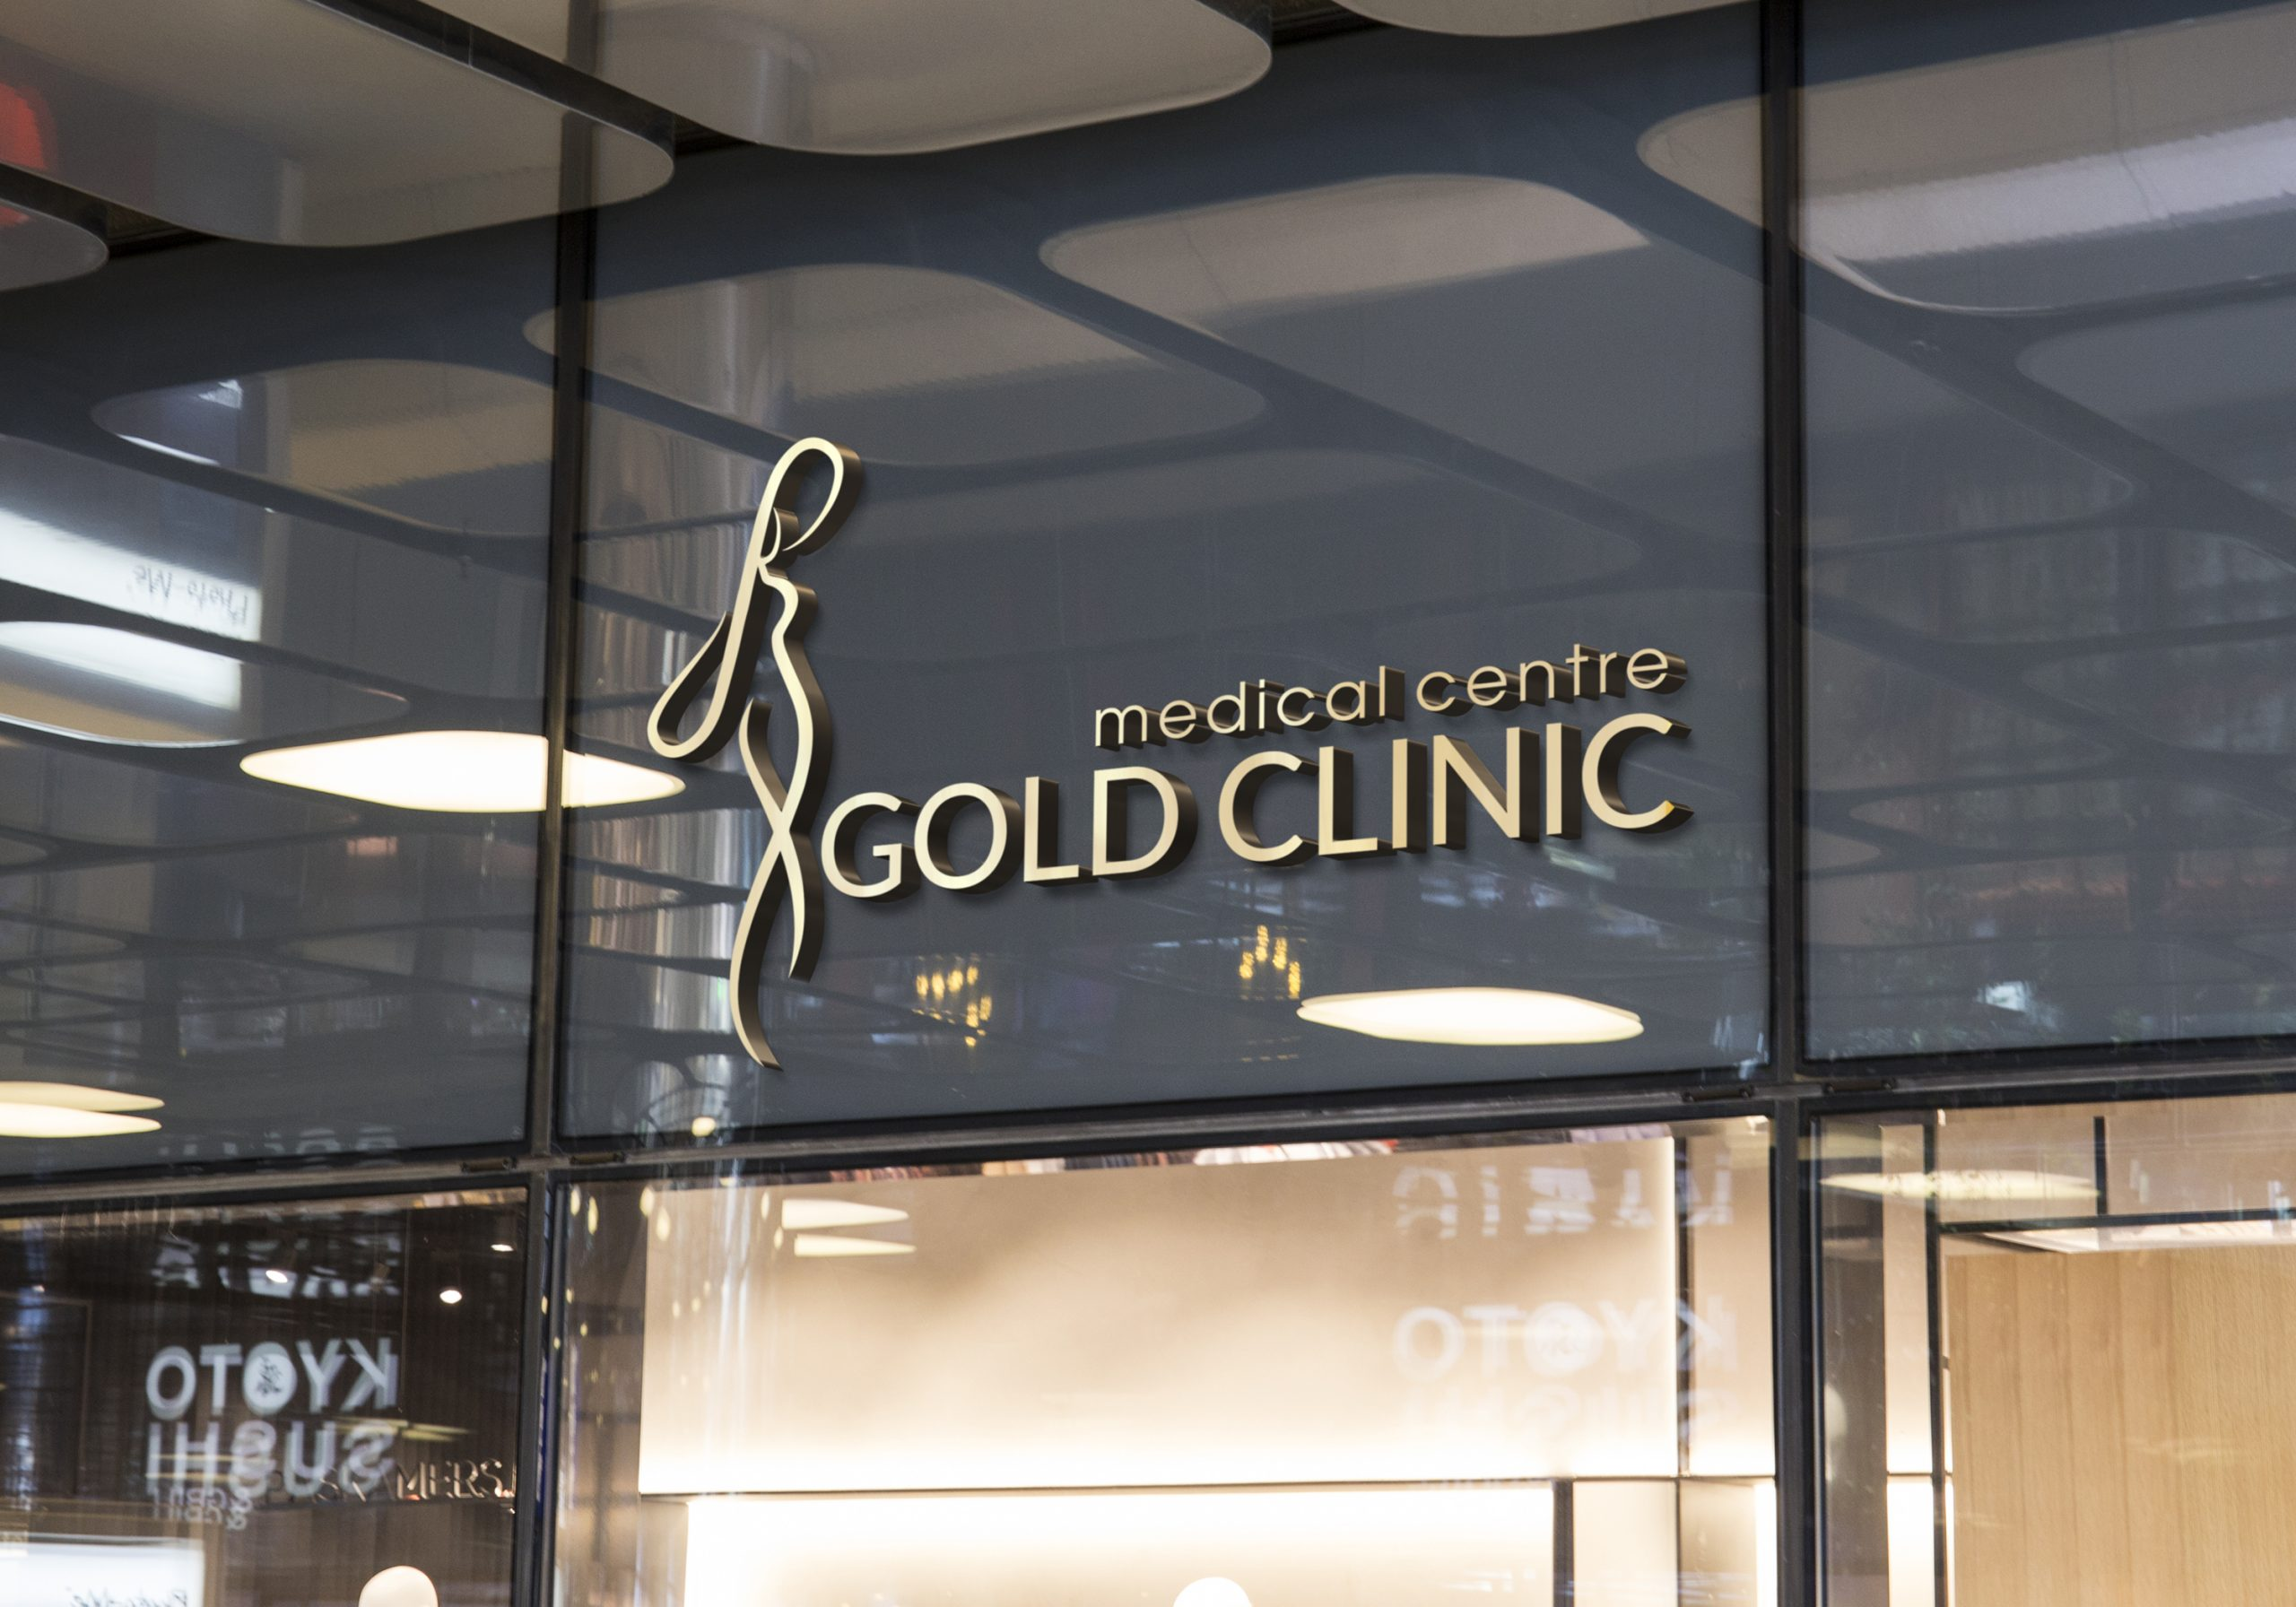 Gold Clinic logo